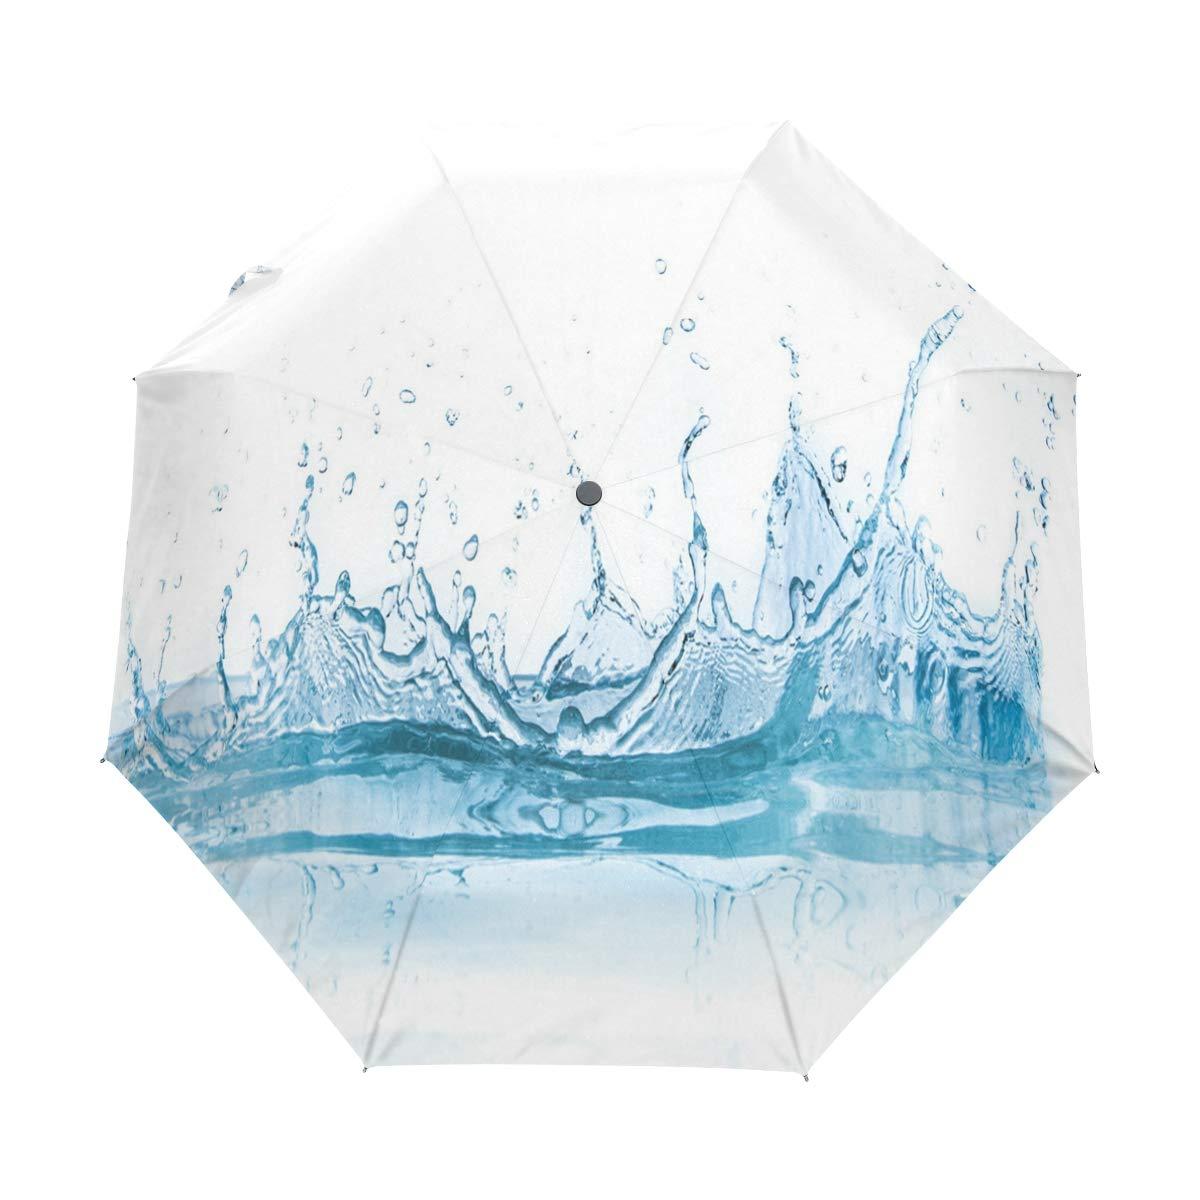 OuLian 傘 高速 水滴 ゴルフ 旅行 太陽 雨 防風 自動傘 UV保護付き ガールズ ボーイズ キッズ   B07MV9XGLC